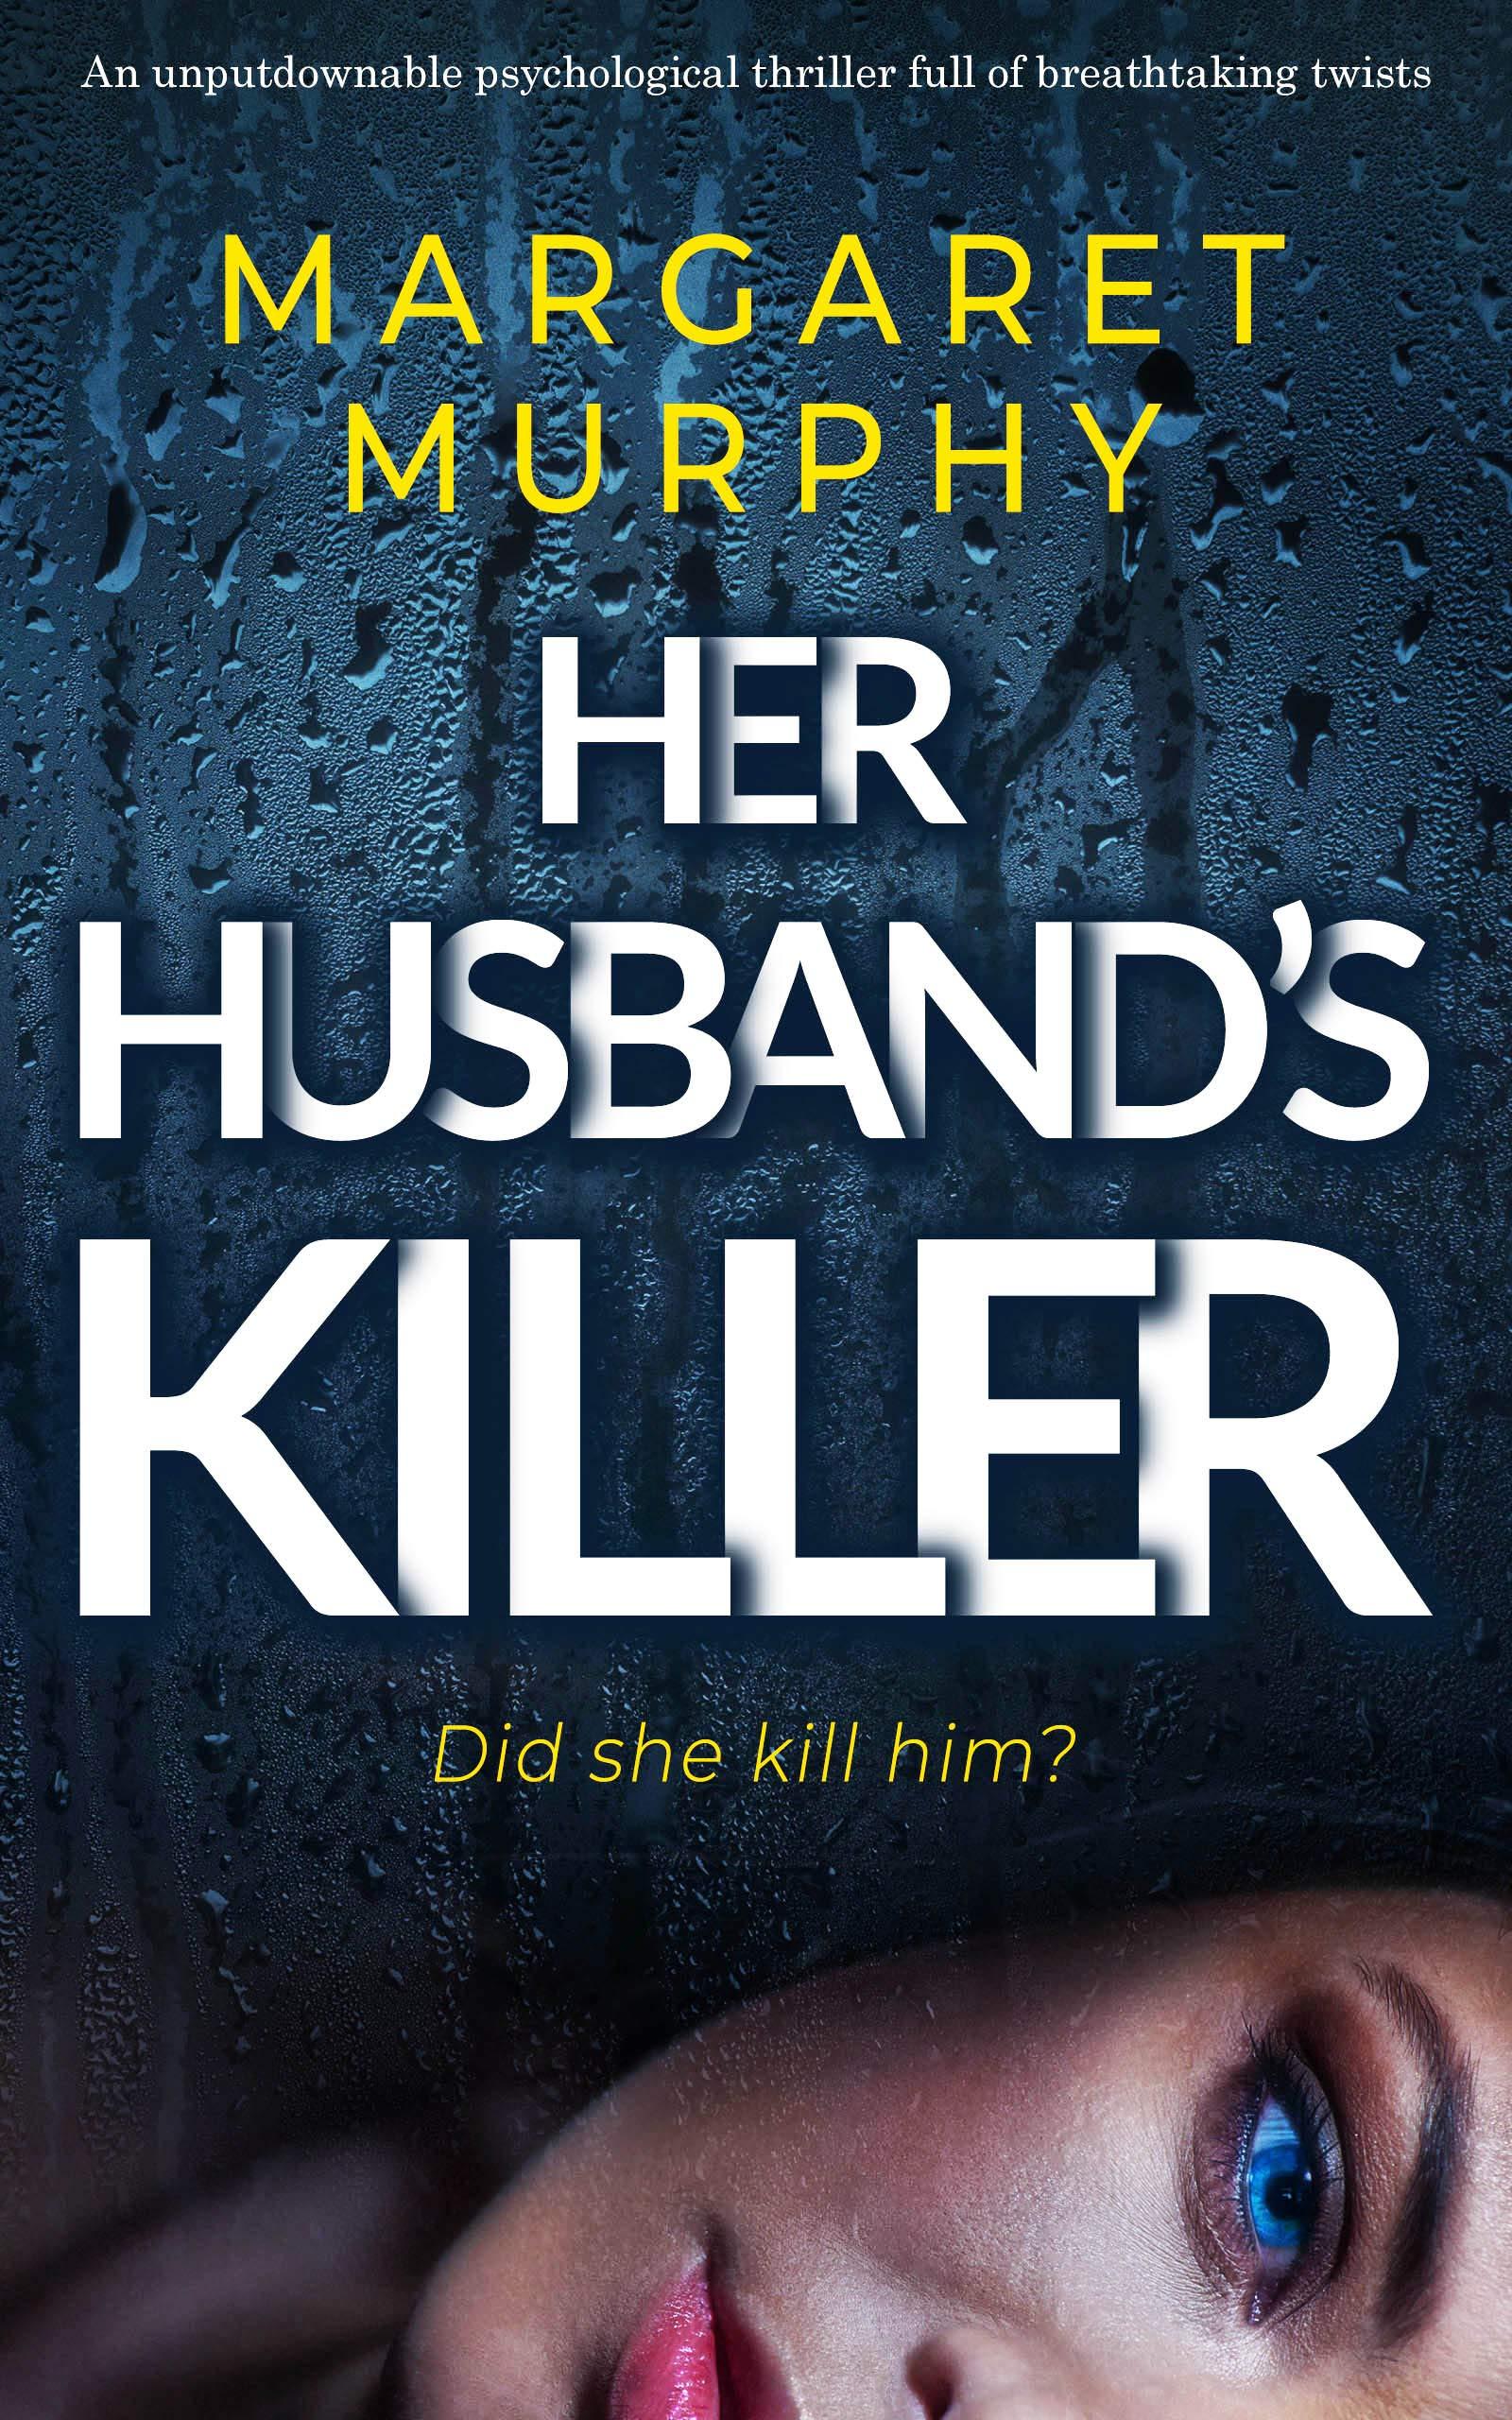 HER HUSBAND'S KILLER an unputdownable psychological thriller full of breathtaking twists